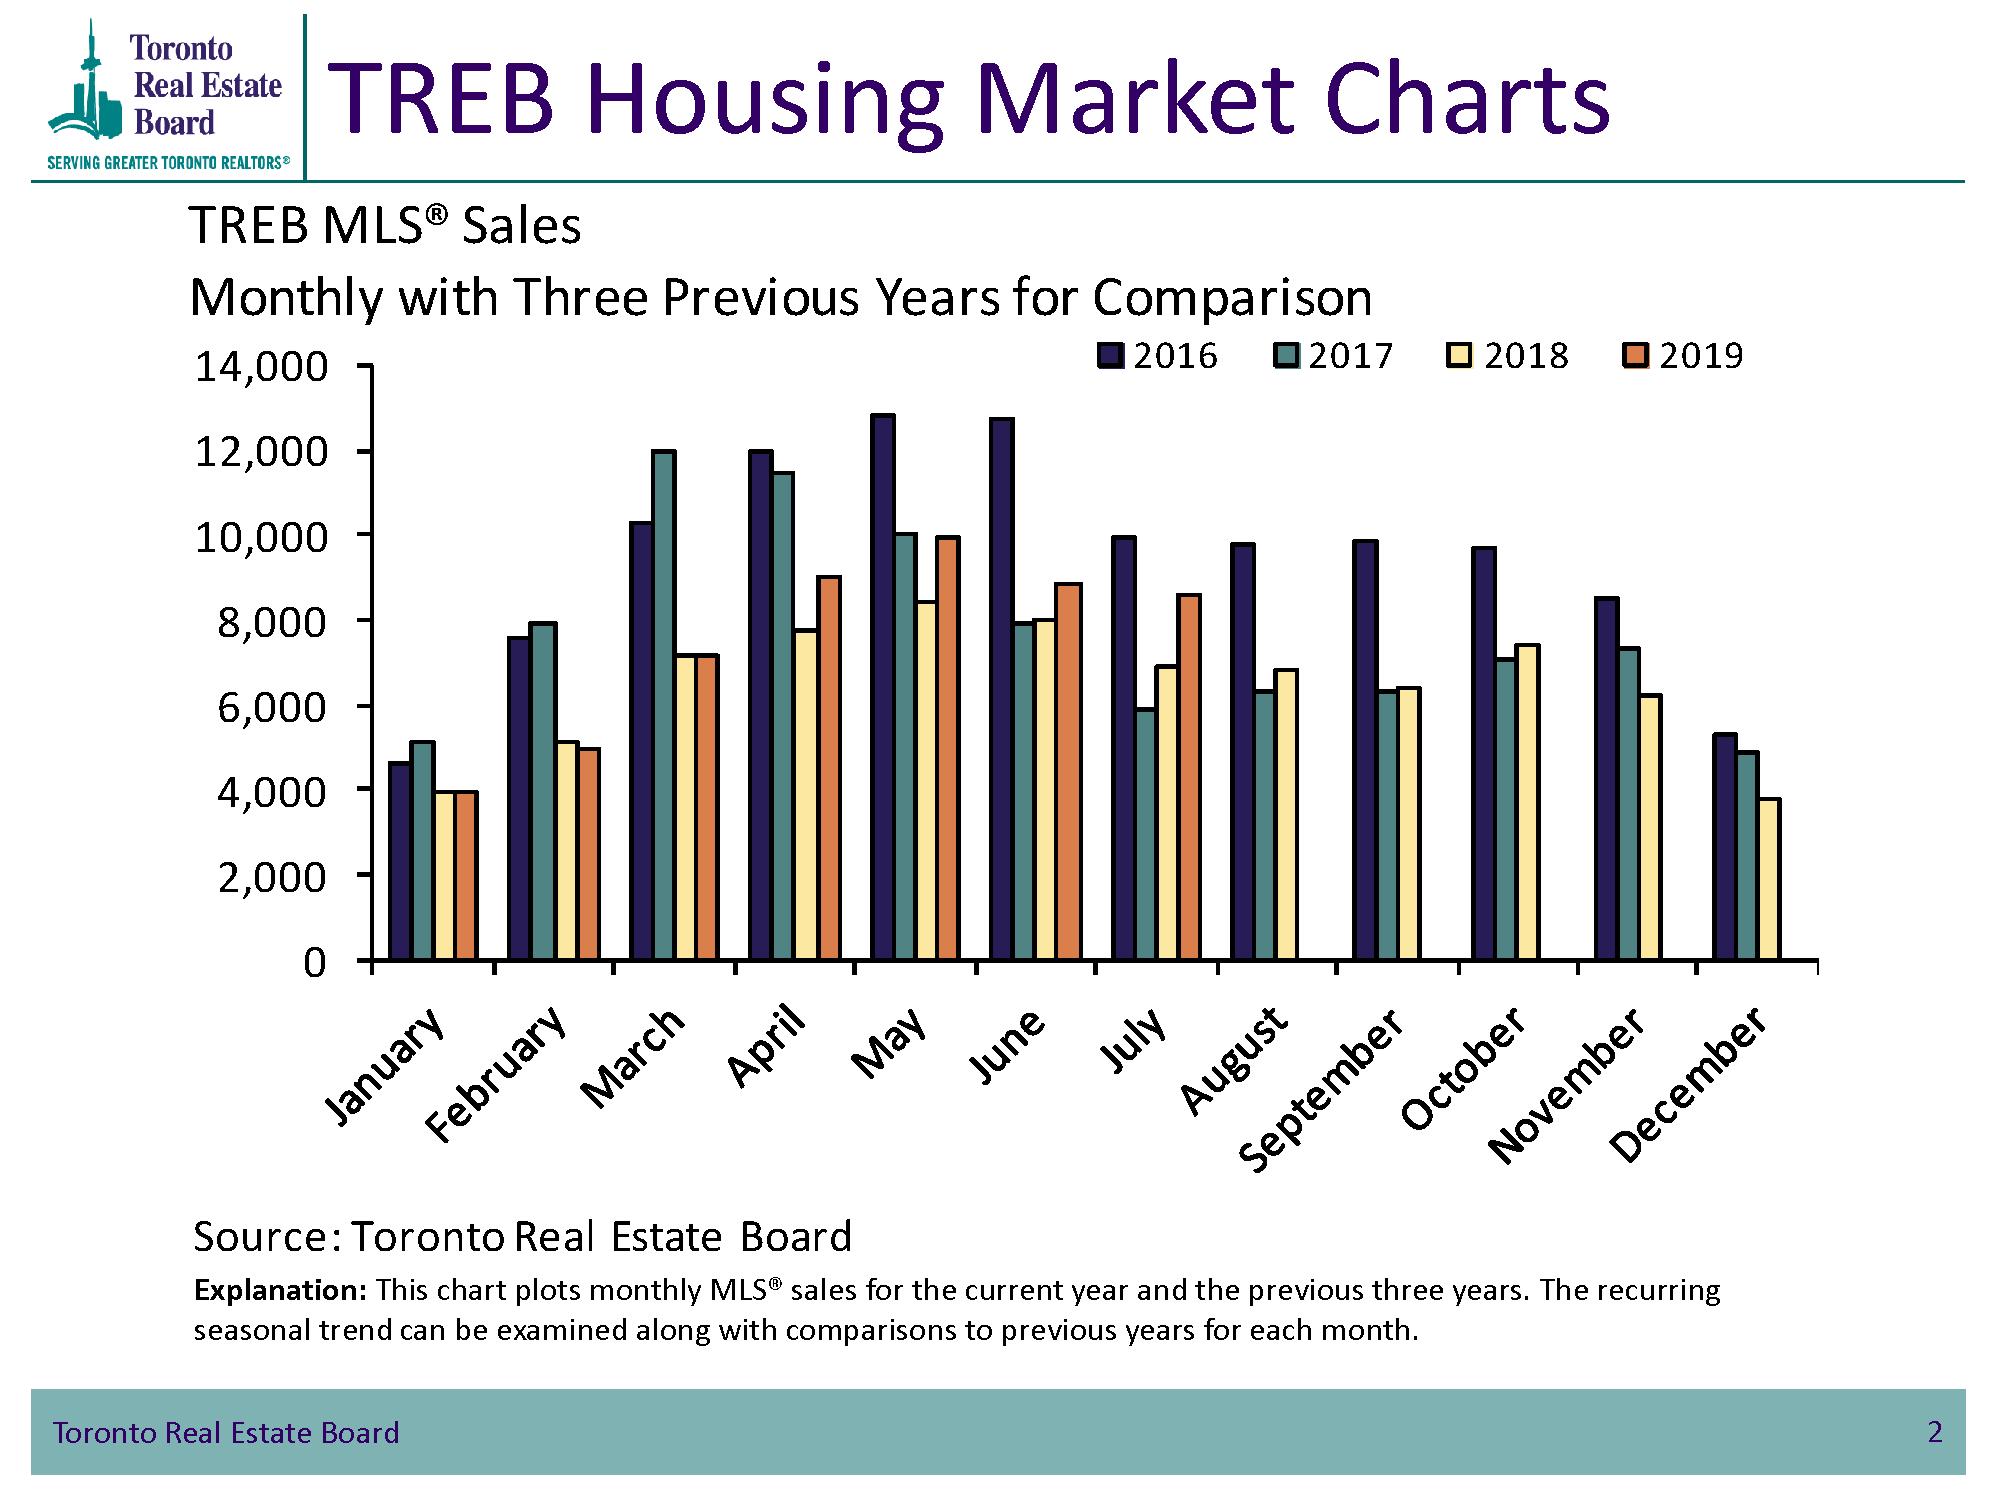 TREB Housing Market Charts, Toronto MLS | iDEALtorontocondos